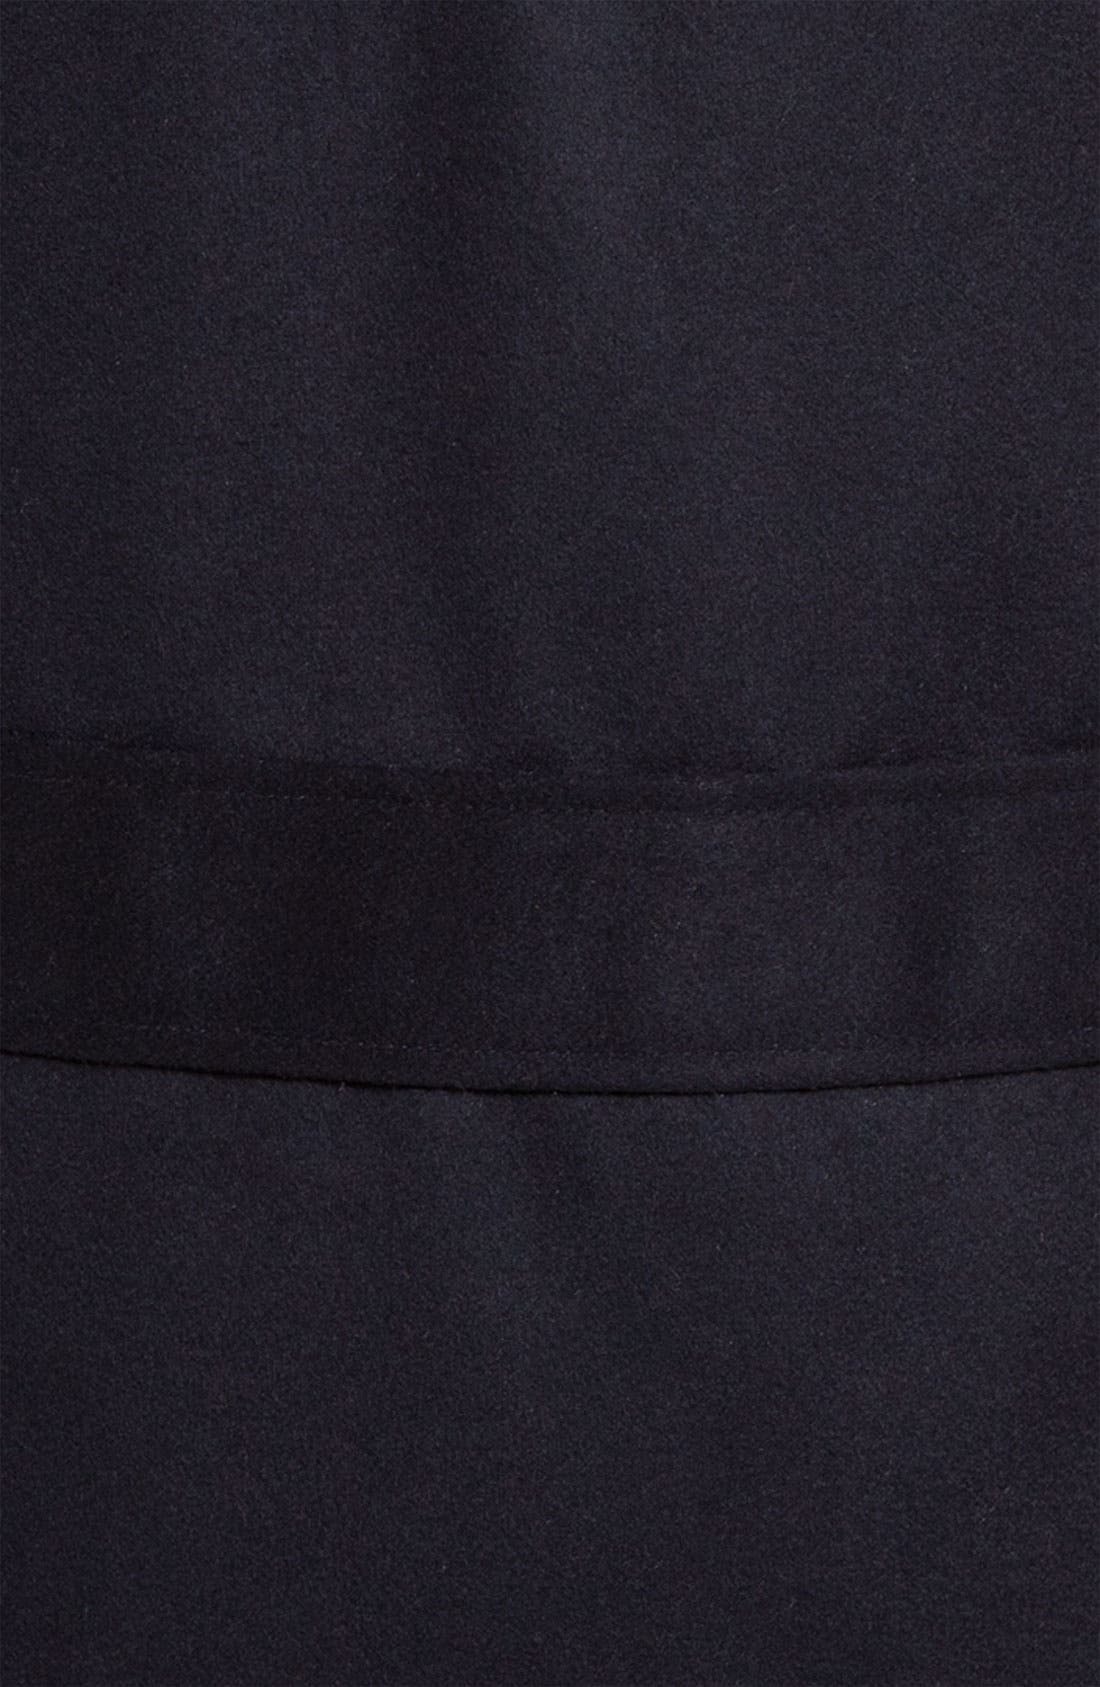 Alternate Image 3  - rag & bone 'Dover' Jacket